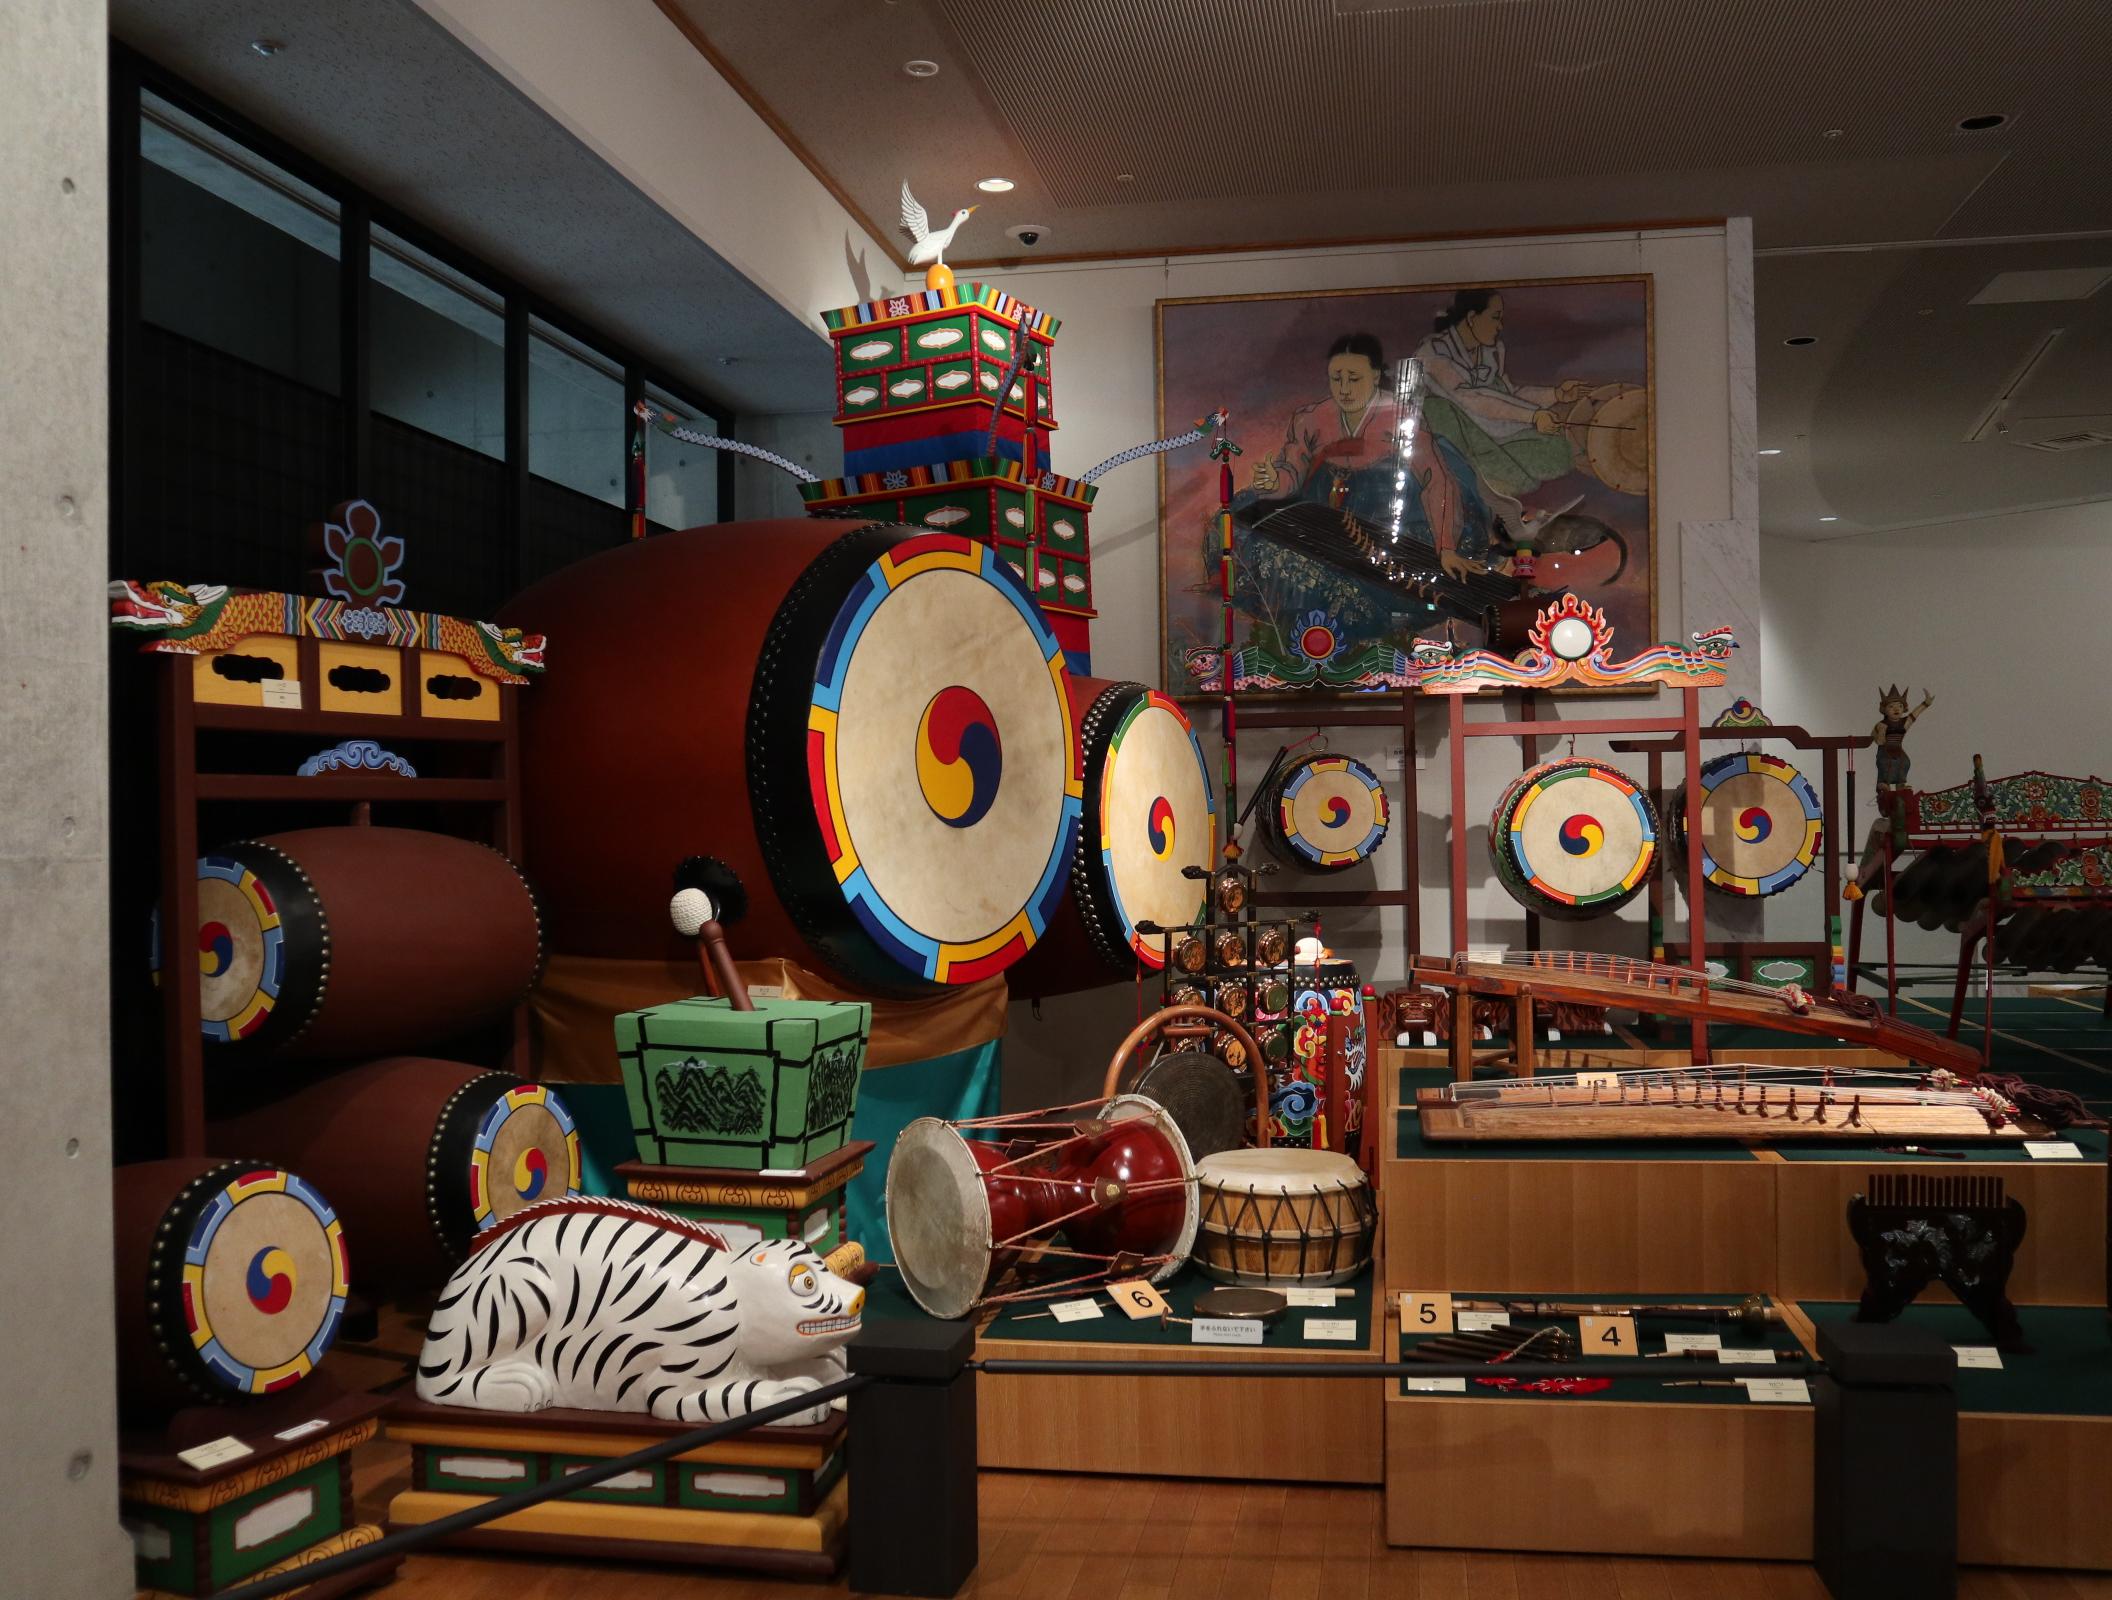 Instruments of Korea